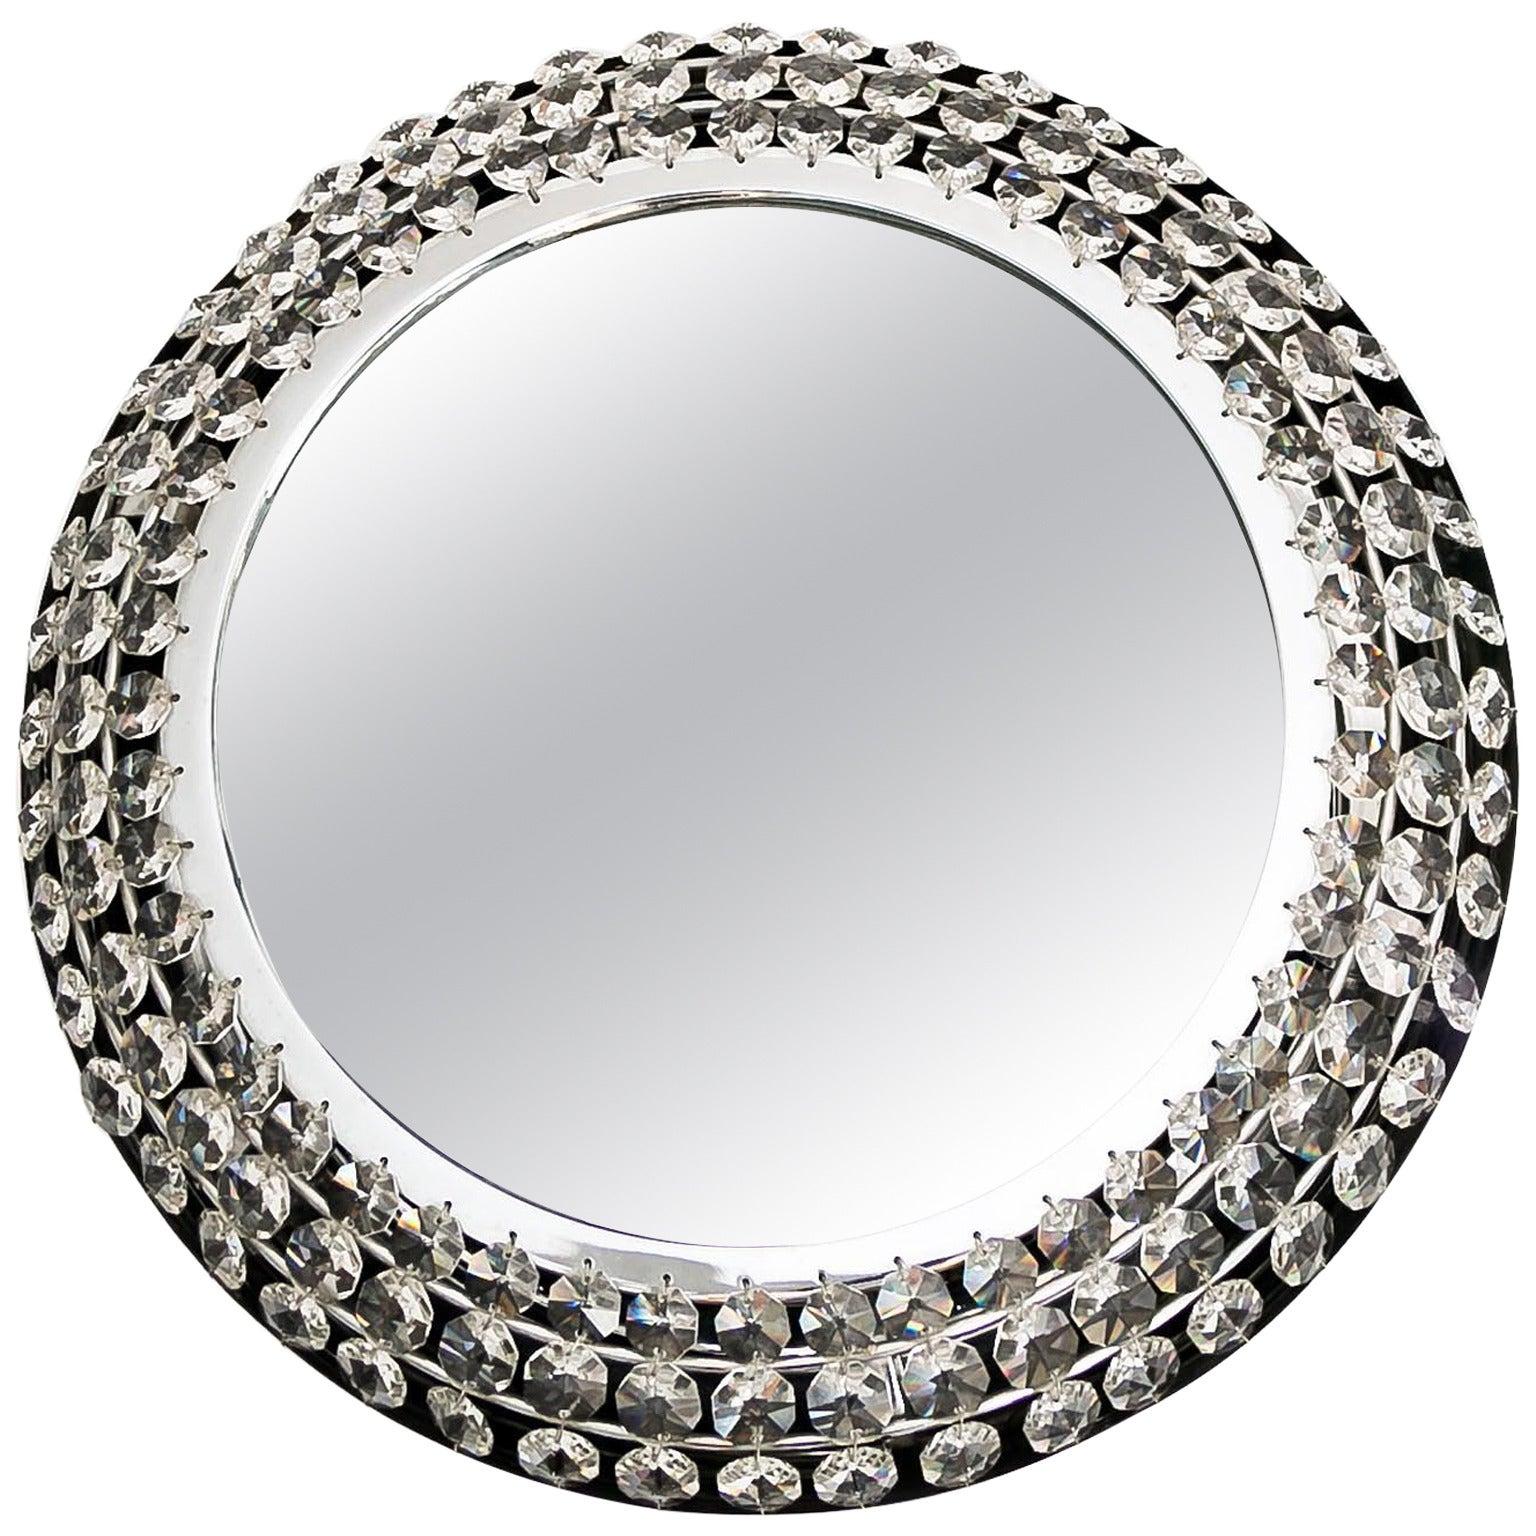 Palwa Backlit Mirror Illuminated Crystal Nickel Chrome Glass, Germany, 1960s